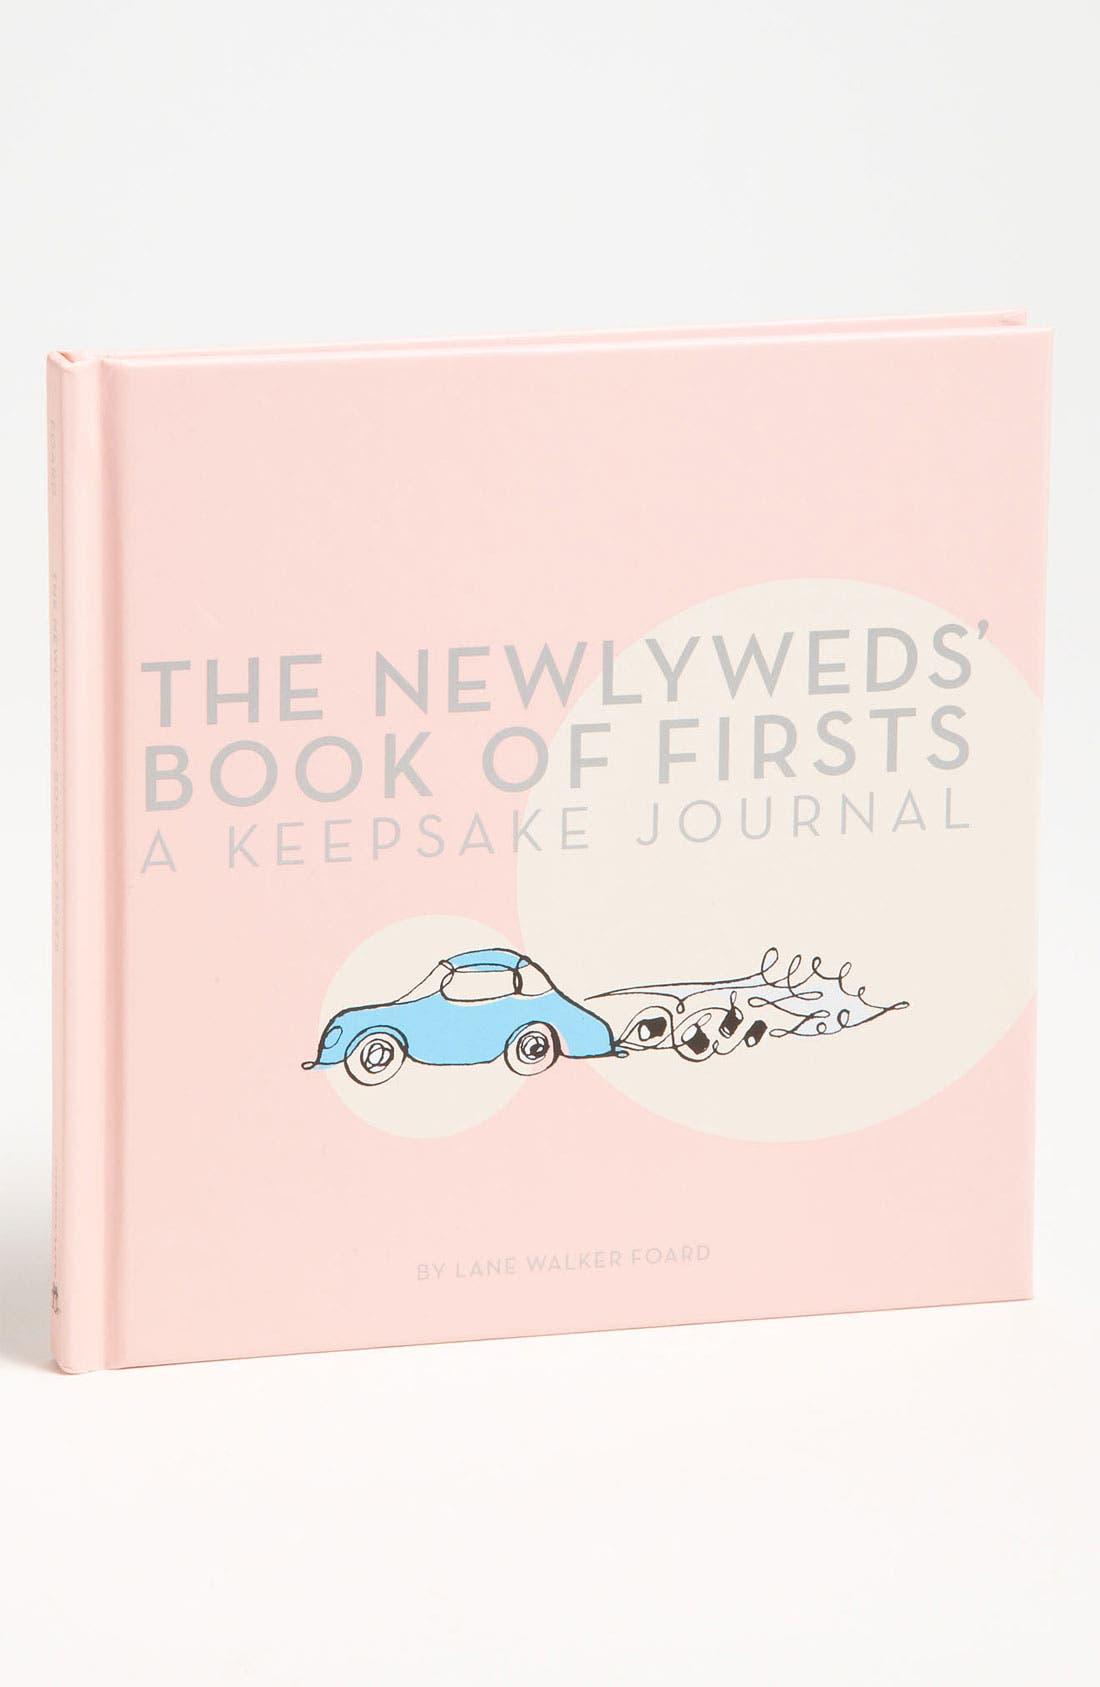 Lane Walker Foard 'The Newlyweds' Book of Firsts' Keepsake Journal, Main, color, 960